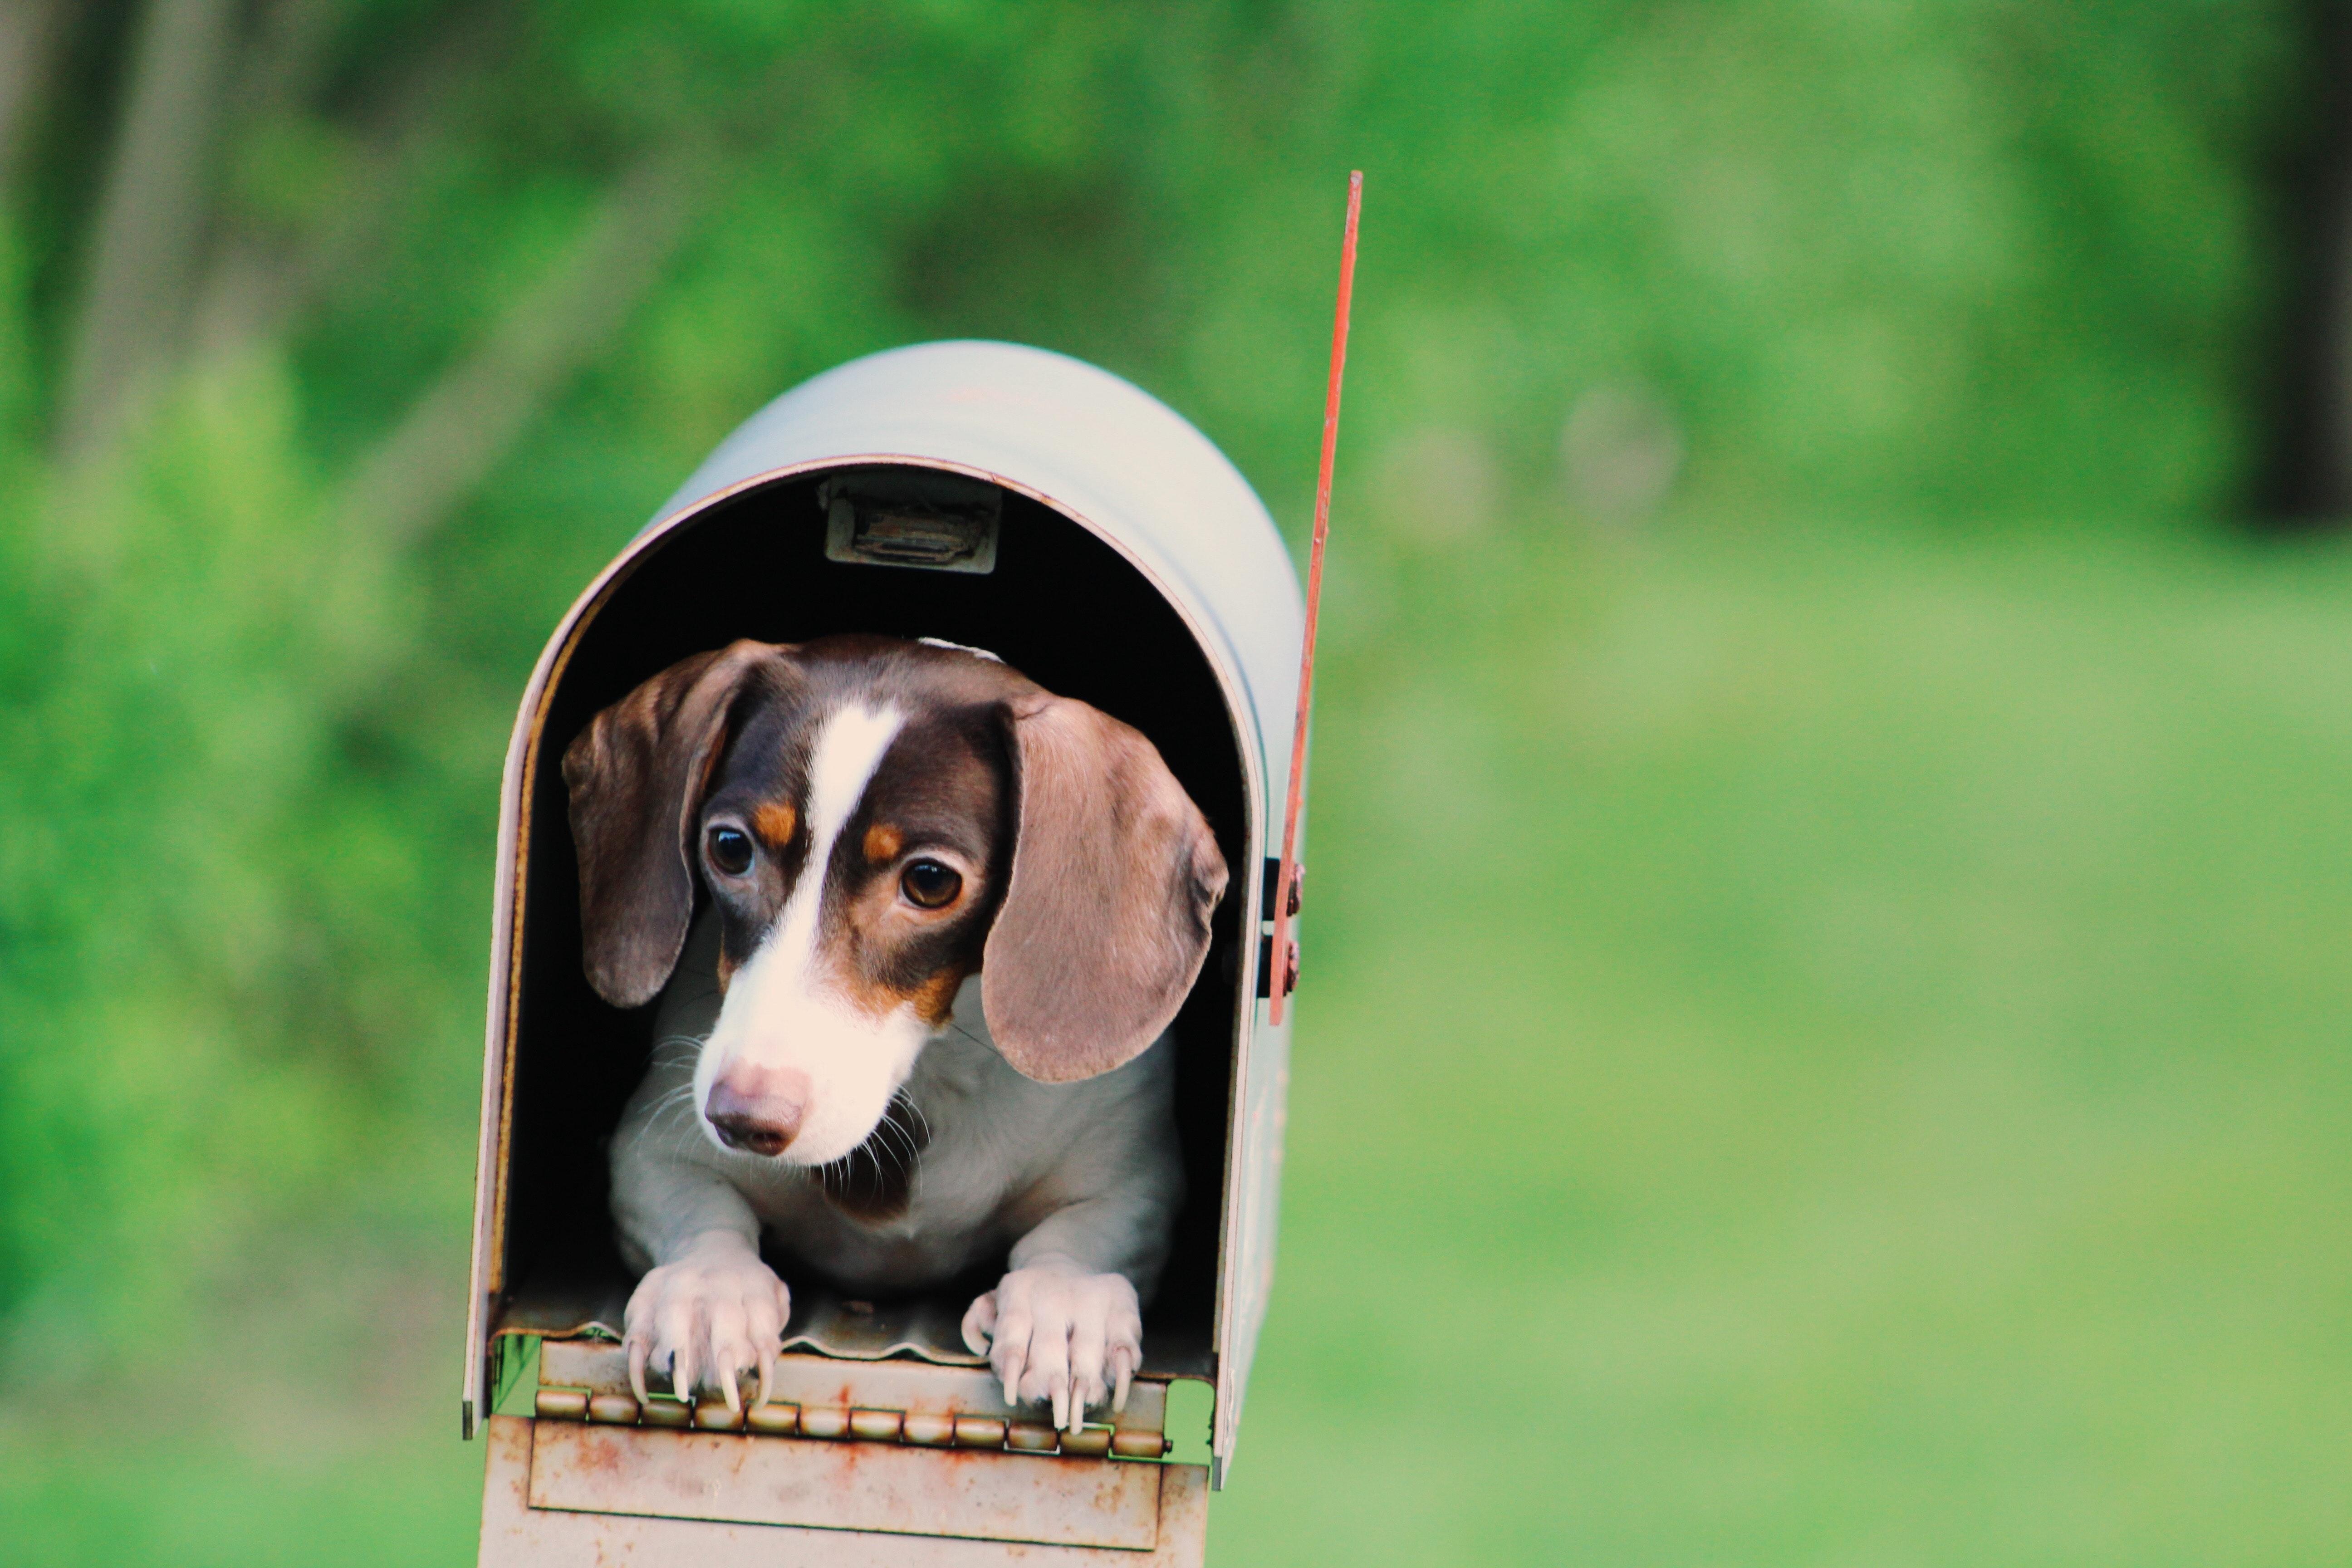 dog-inside-mailbox-906065